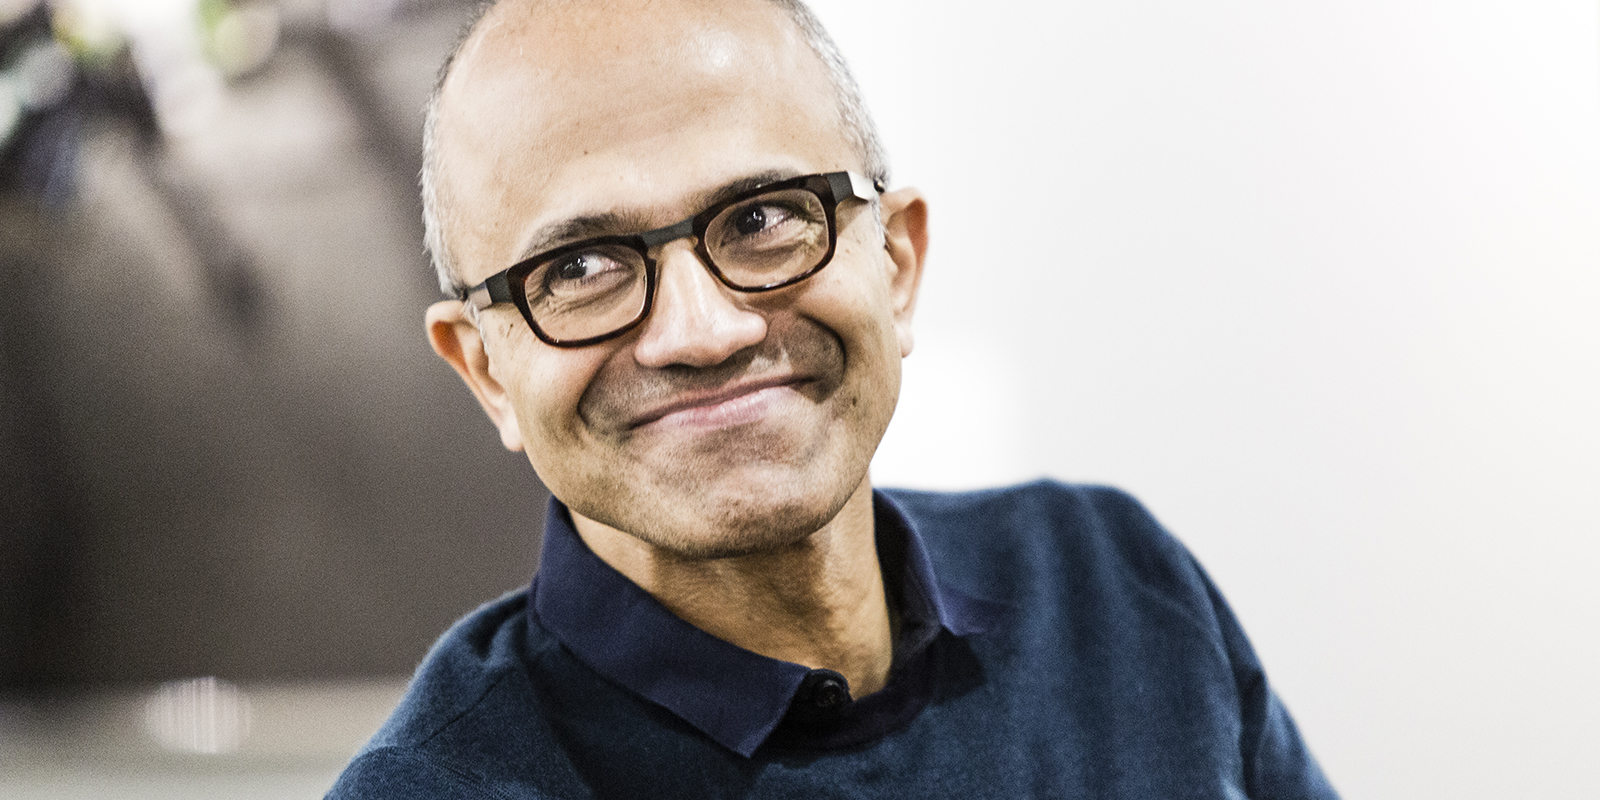 CEO Microsoft, Satya Nadella reacts to failed TikTok deal